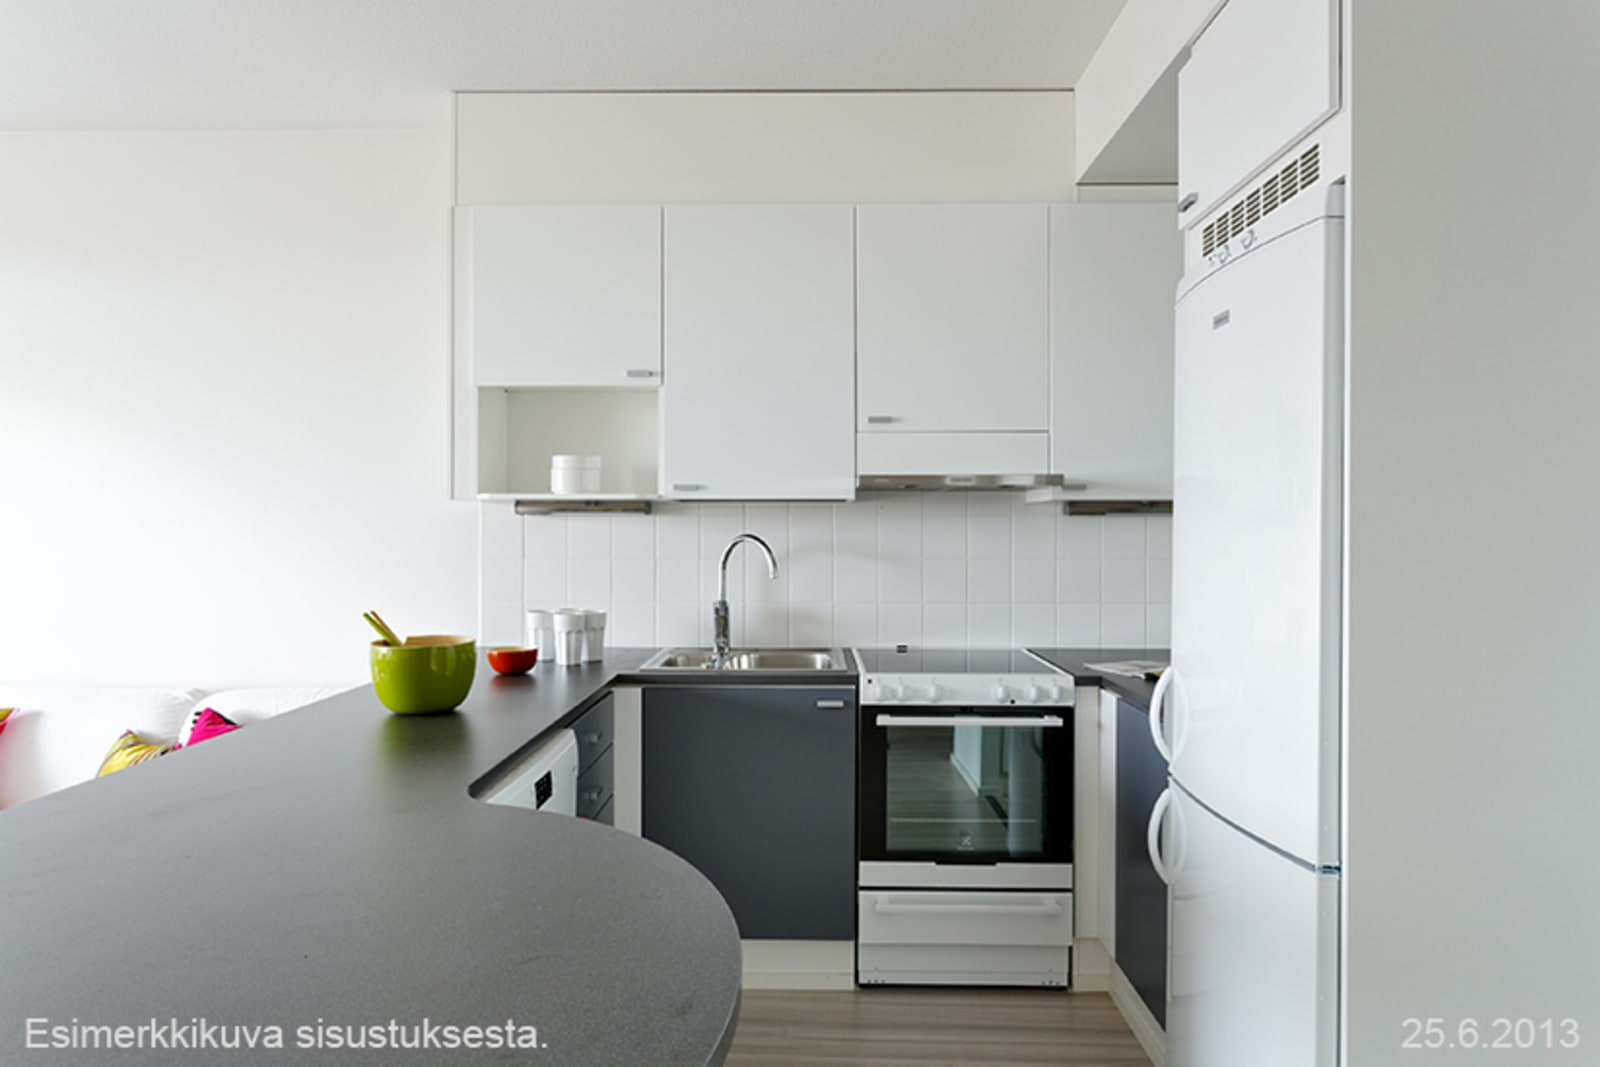 Helsinki, Jätkäsaari, Rionkatu 11